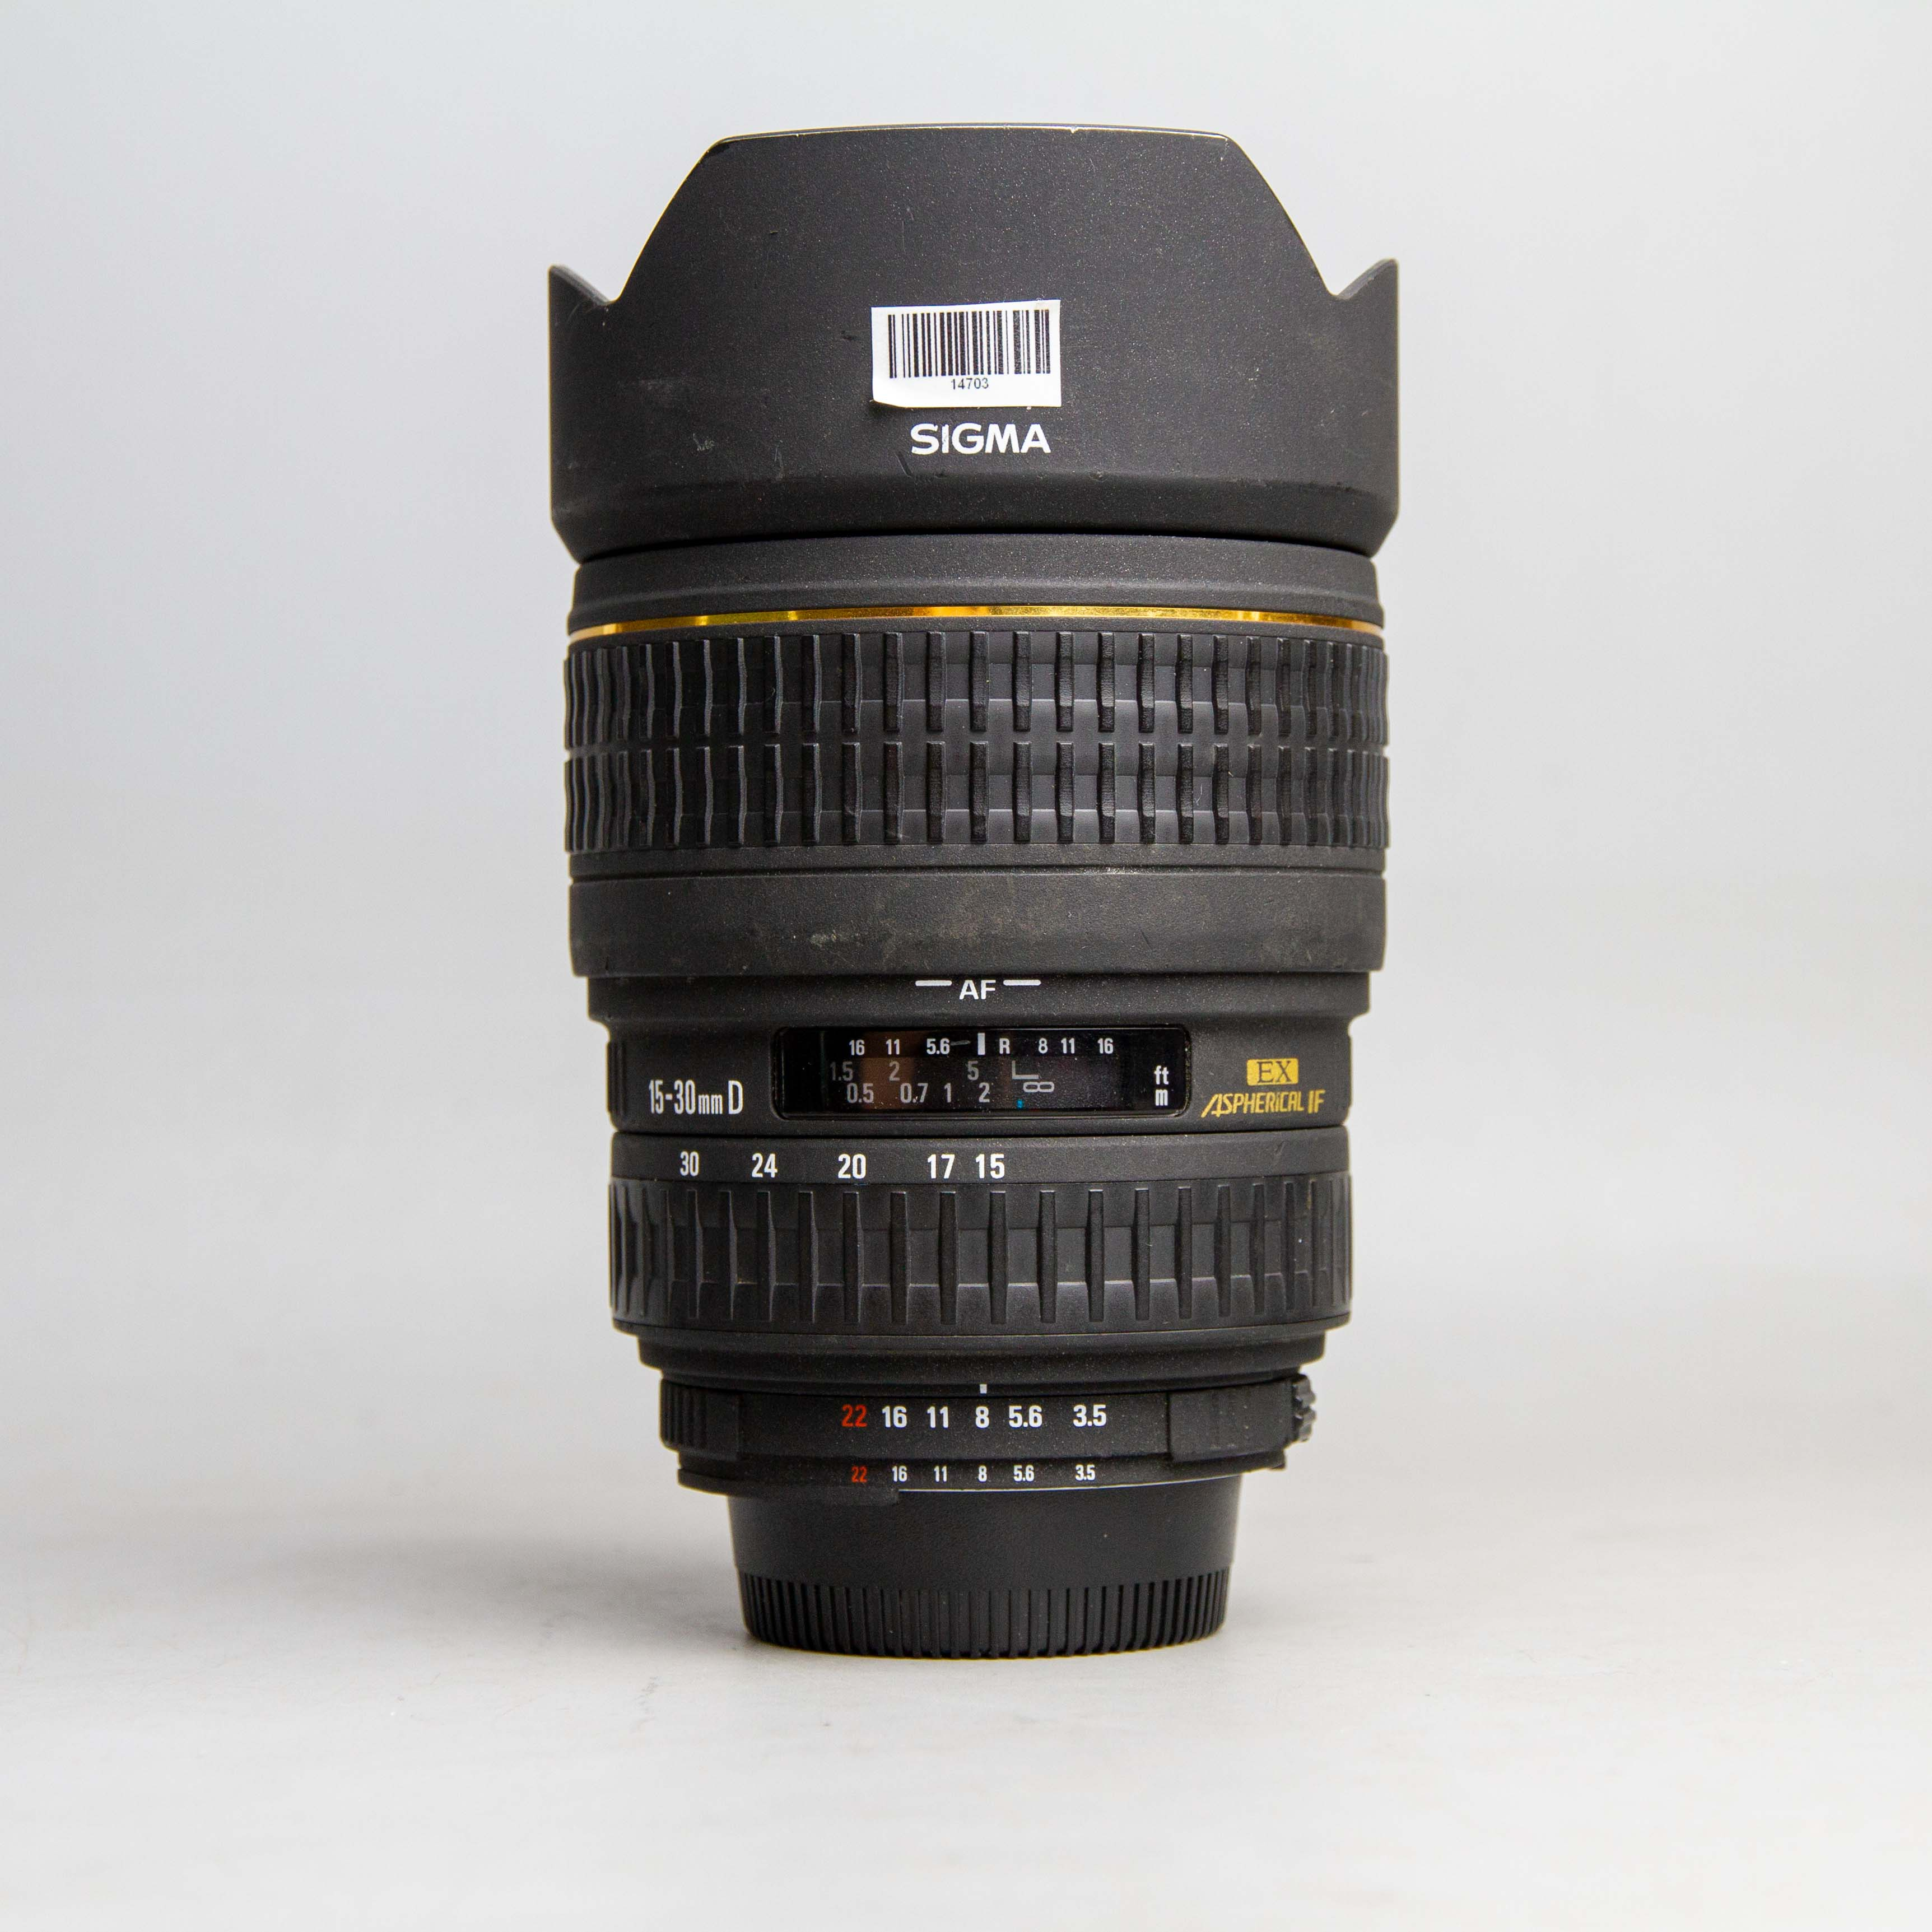 sigma-15-30mm-f3-5-4-5-af-nikon-15-30-3-5-4-5-14703